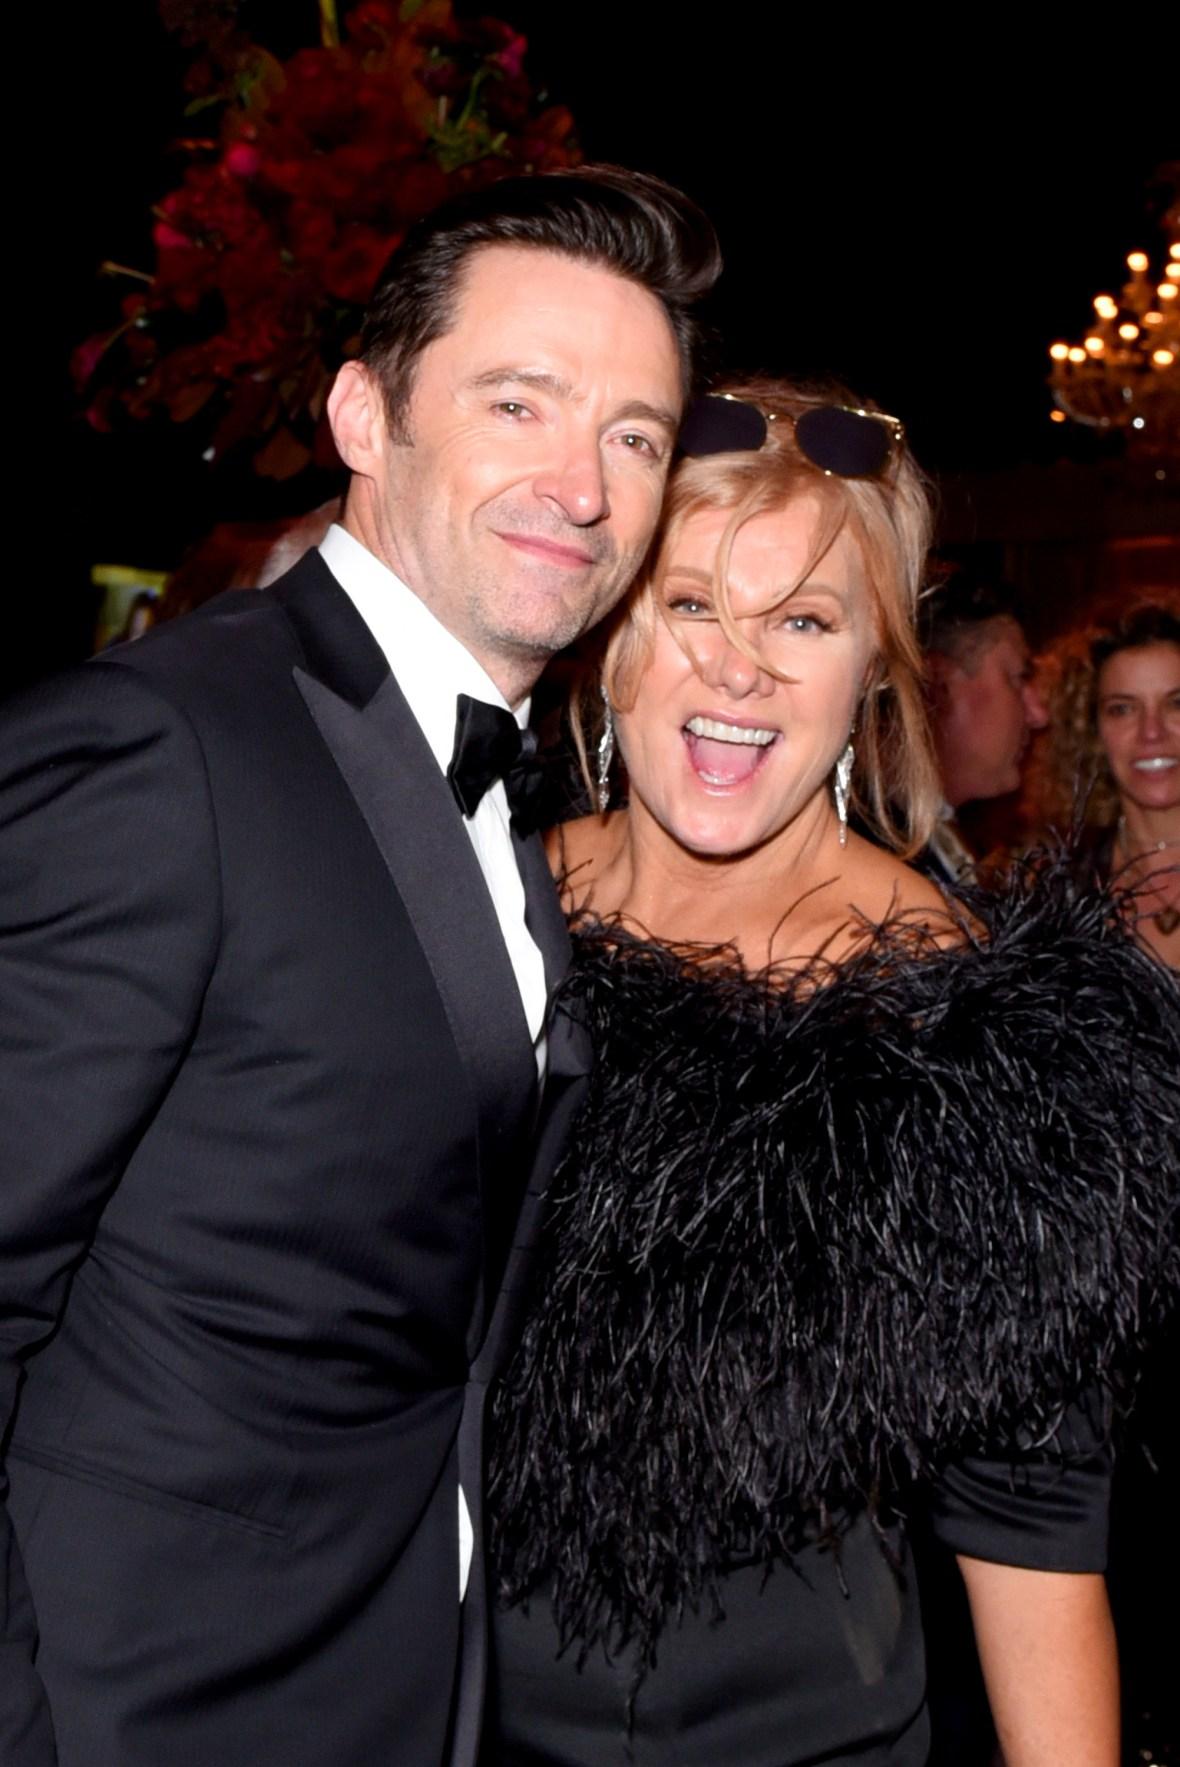 hugh jackman and his wife deborah getty images